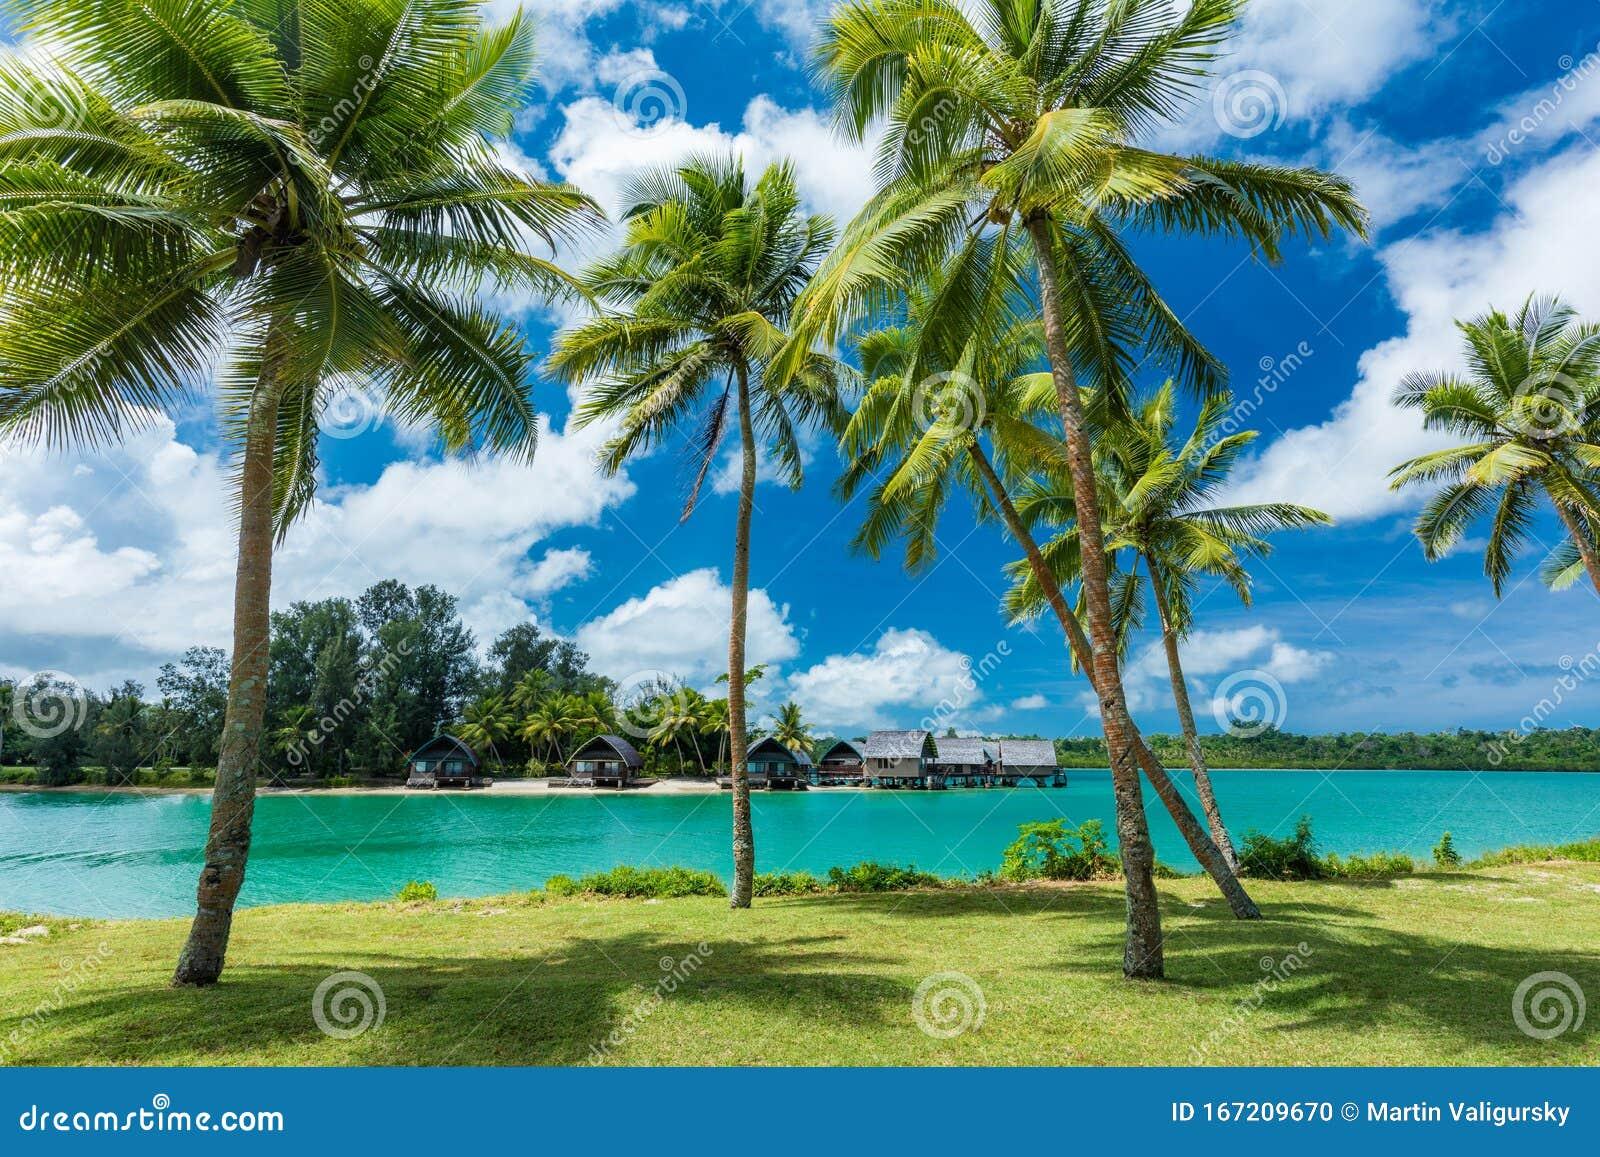 Tropical Resort Destination In Port Vila Efate Island Vanuatu Beach And Palm Trees Stock Photo Image Of Tahiti Vibrant 167209670